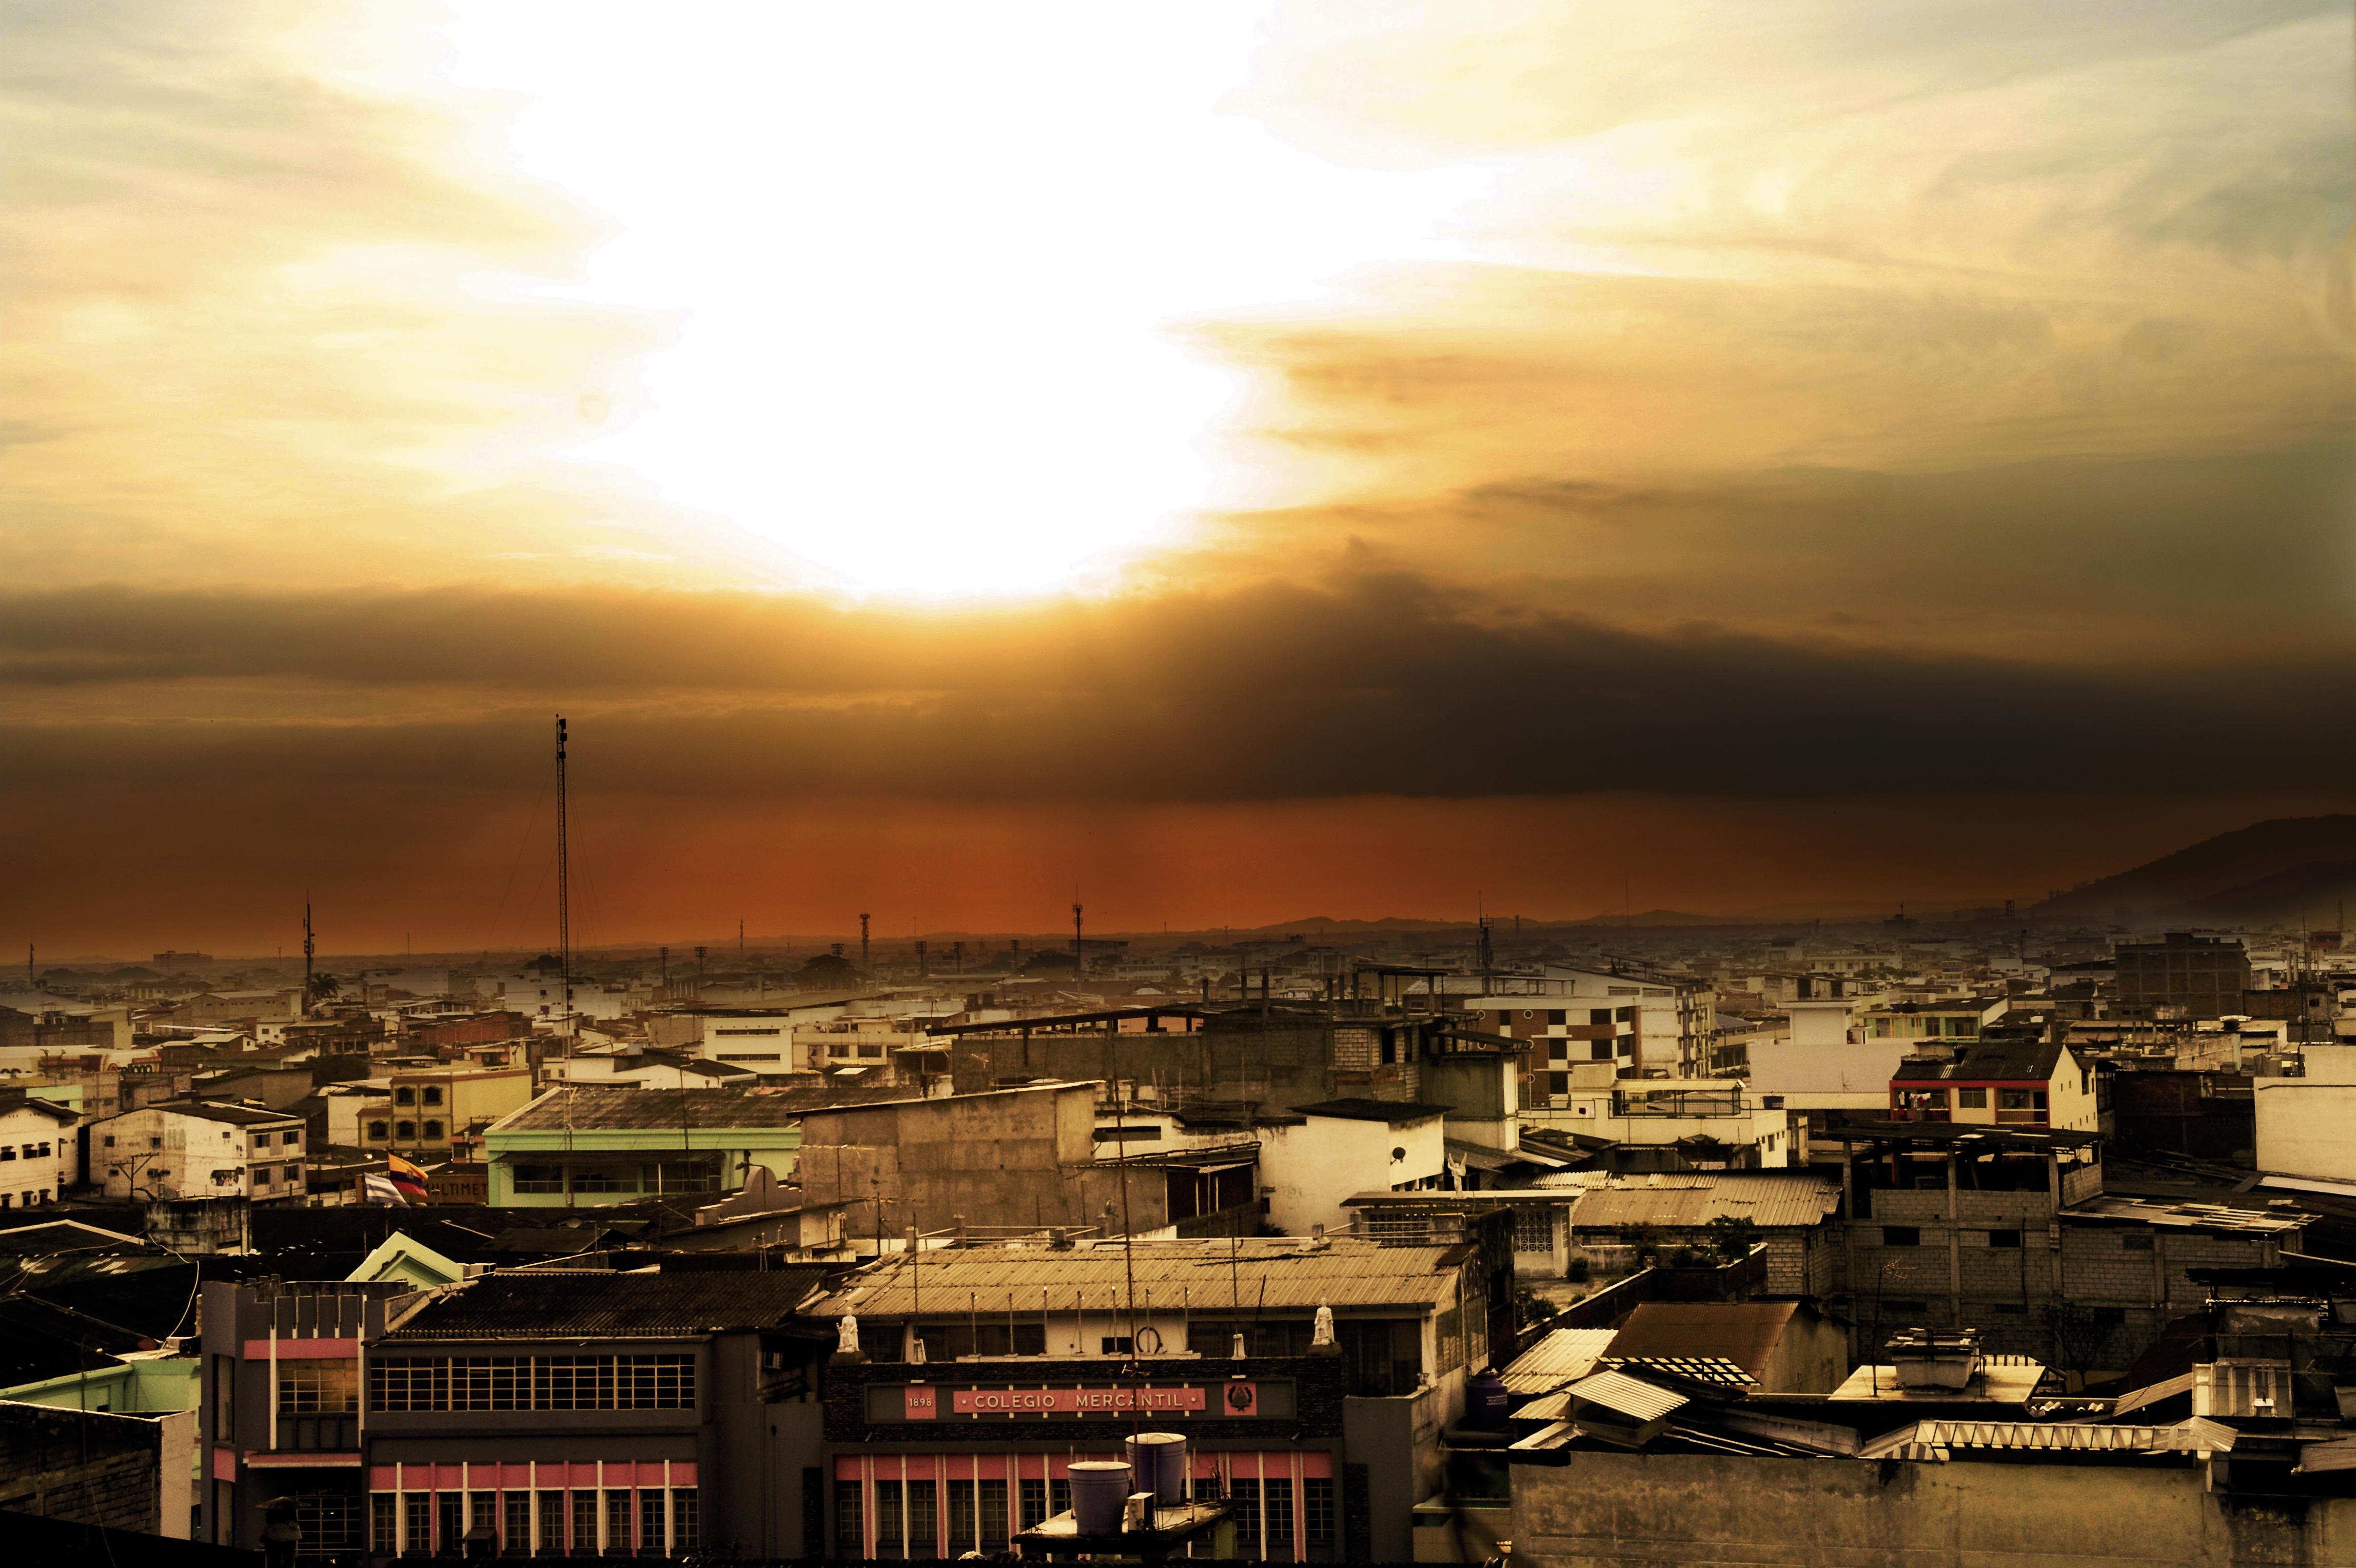 city of gods movie free download